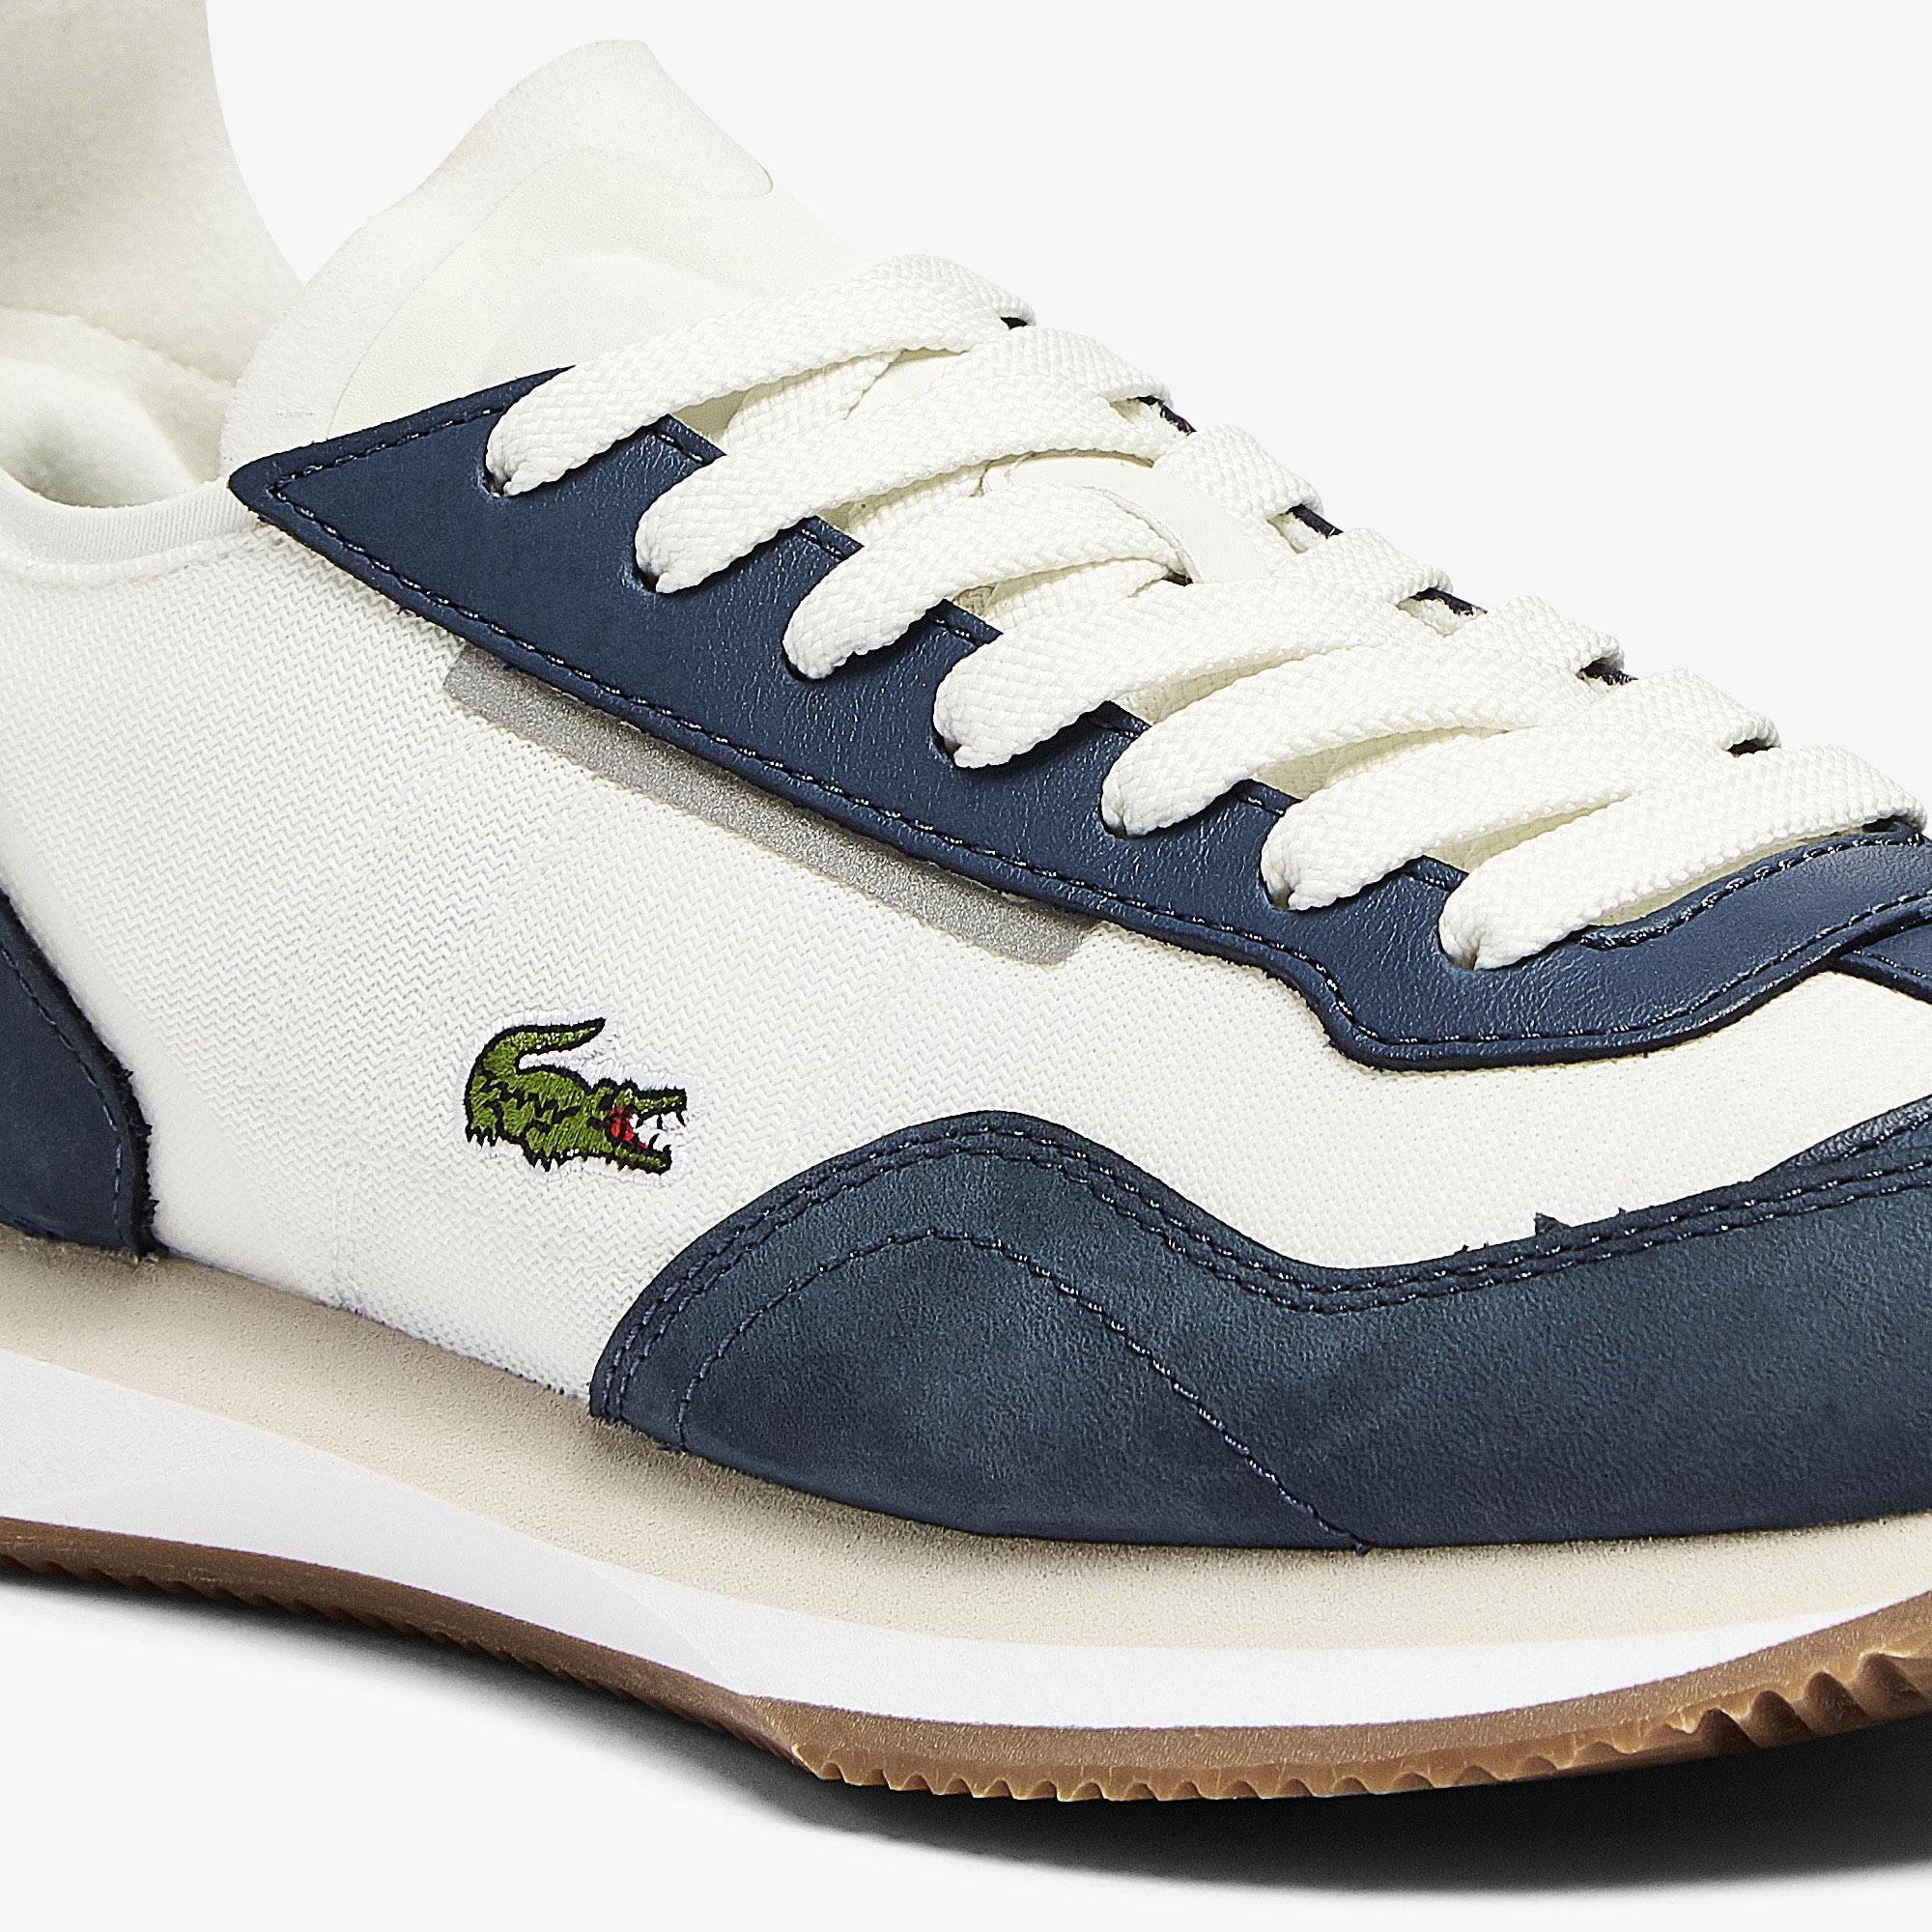 Lacoste Match Break 0721 1 G Sfa Kadın Lacivert - Beyaz Sneaker